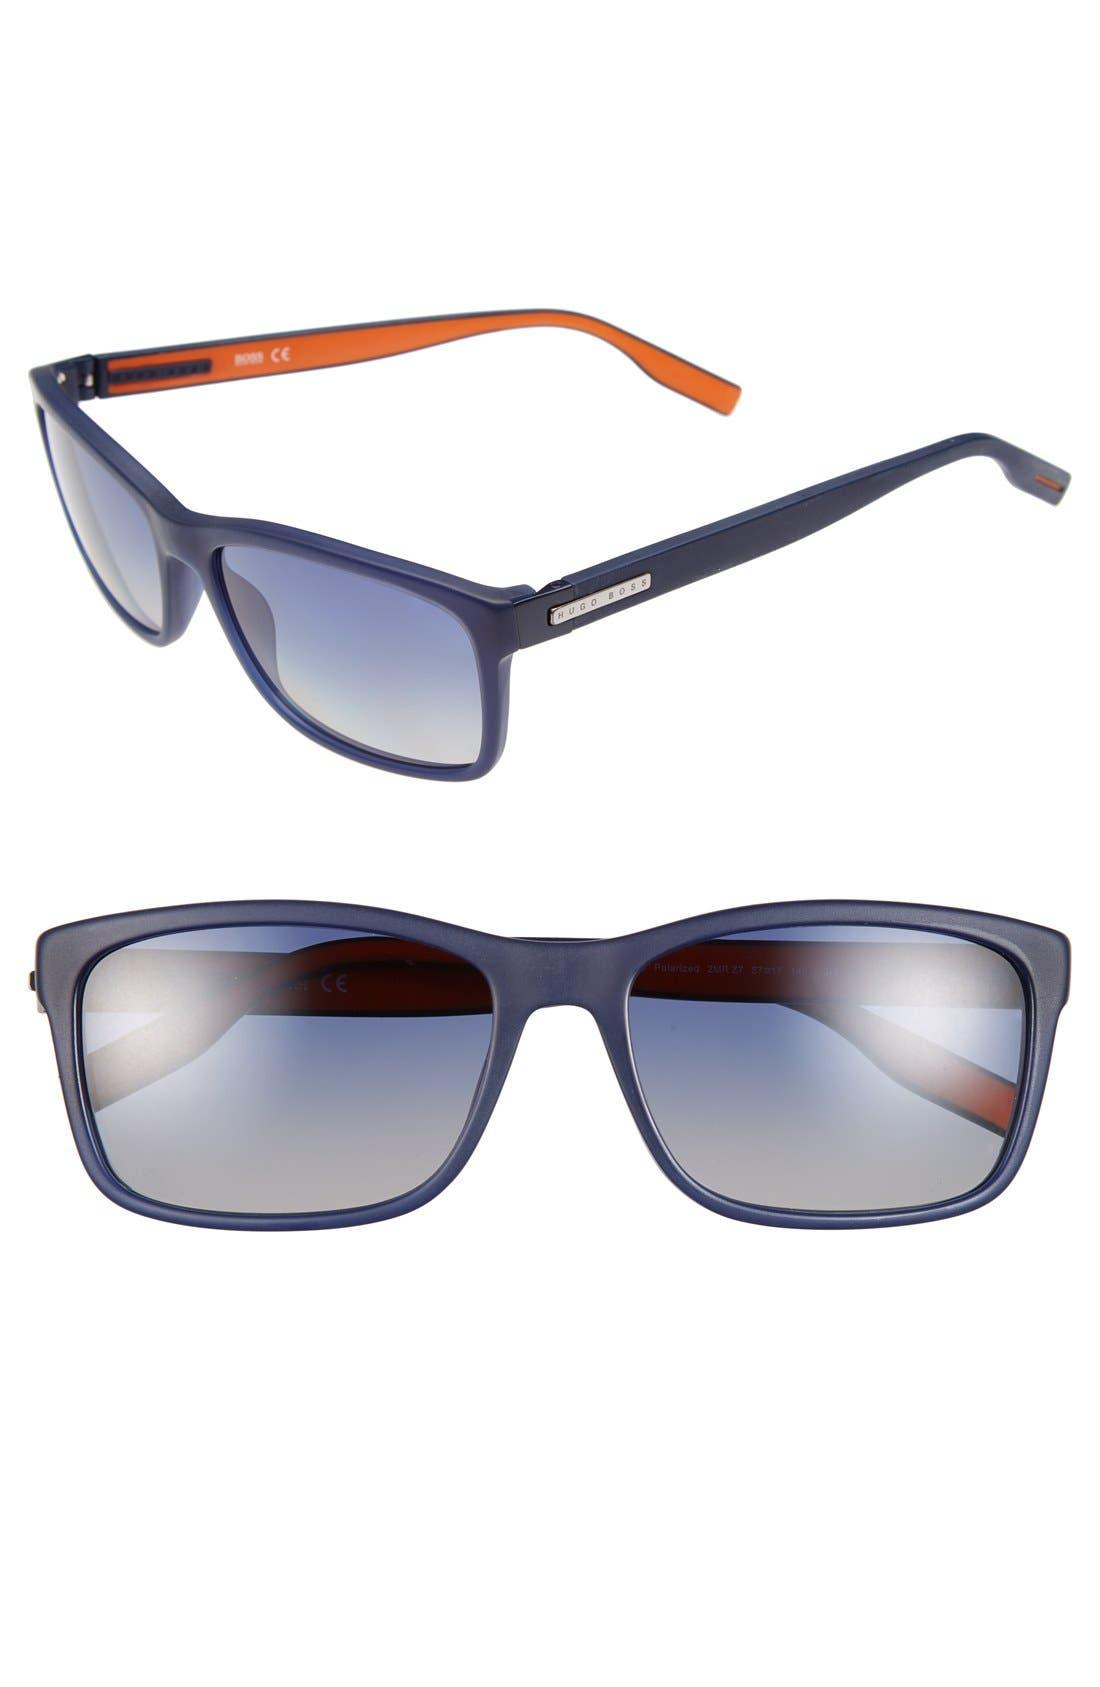 57mm Polarized Retro Sunglasses,                             Main thumbnail 3, color,